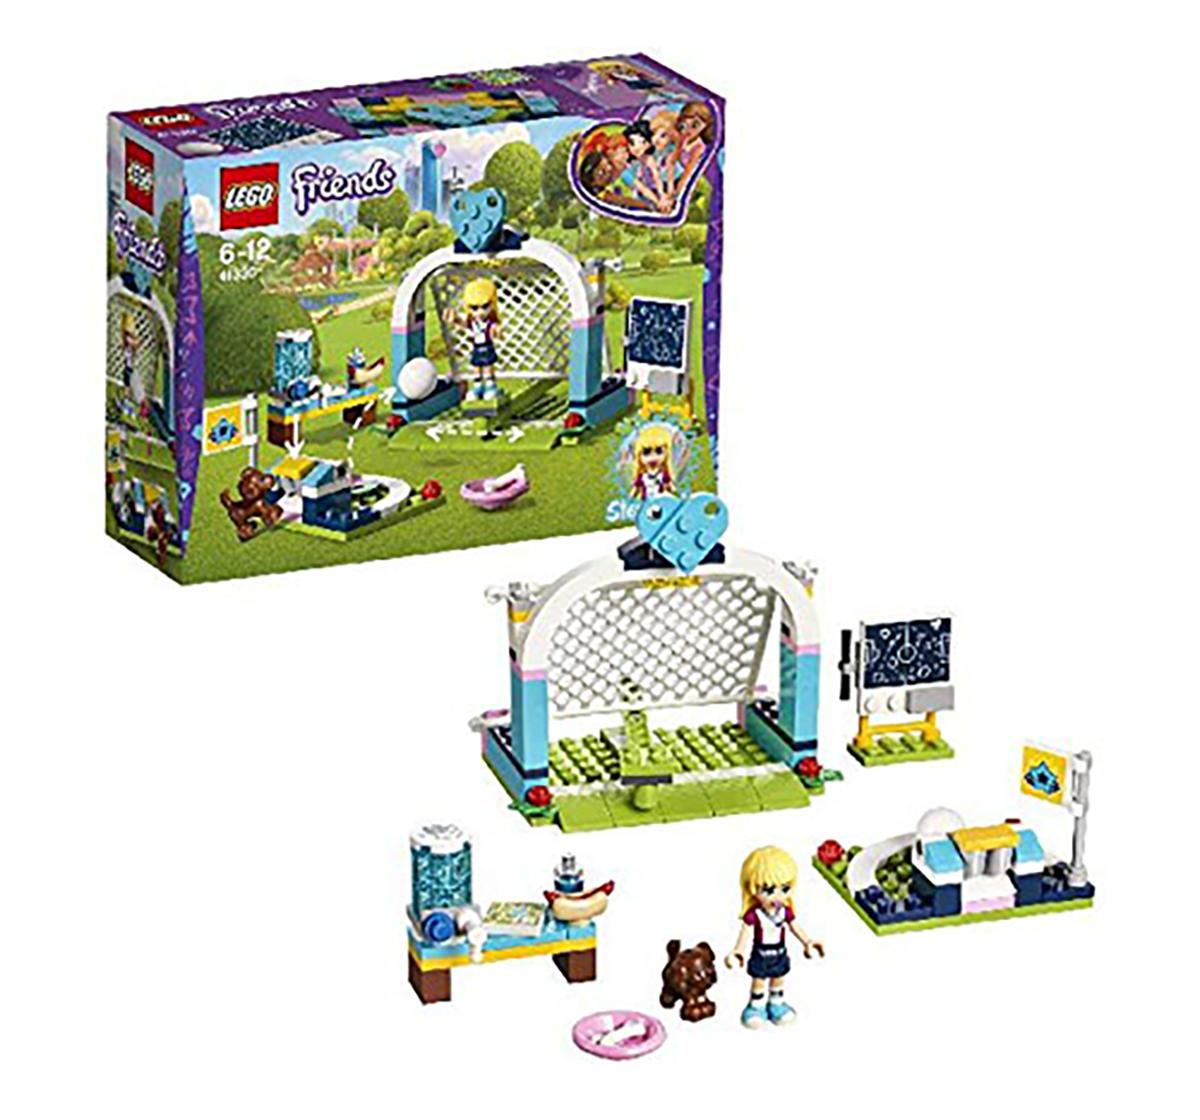 LEGO   Lego Friends Stephanie's Soccer Practice Building Blocks s (119 Pcs) 41330 for Girls age 6Y+